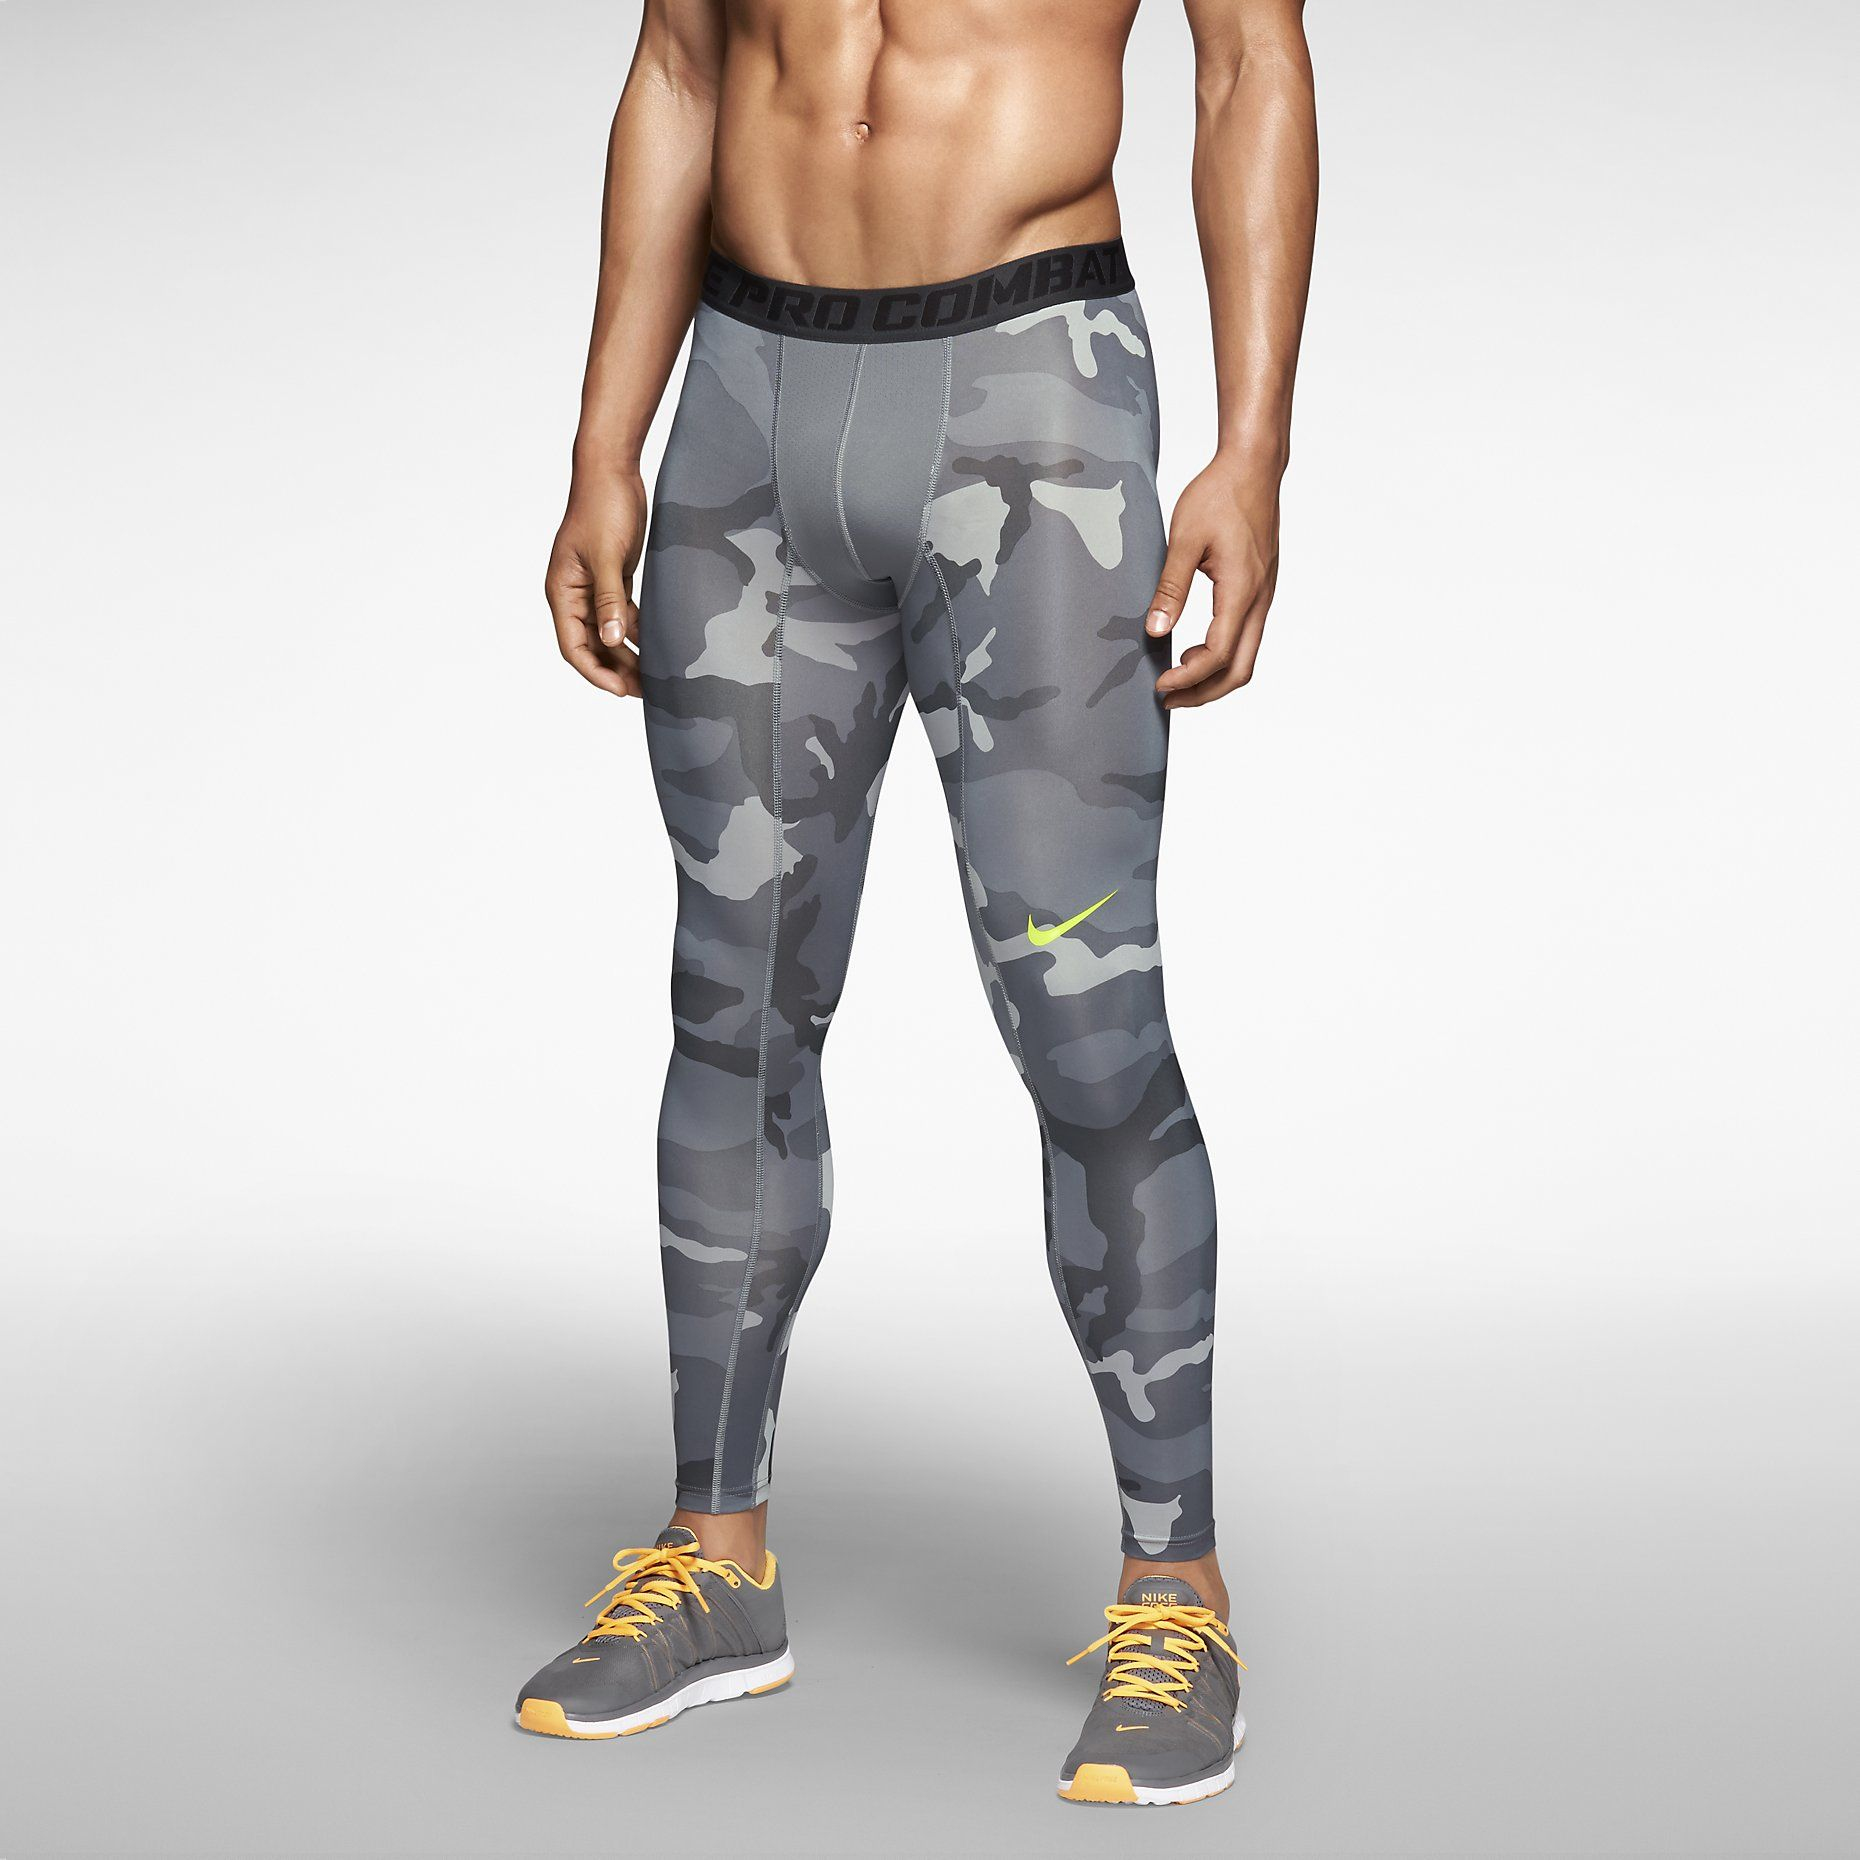 nike pro combat compression tights camo, Nike trainingshose